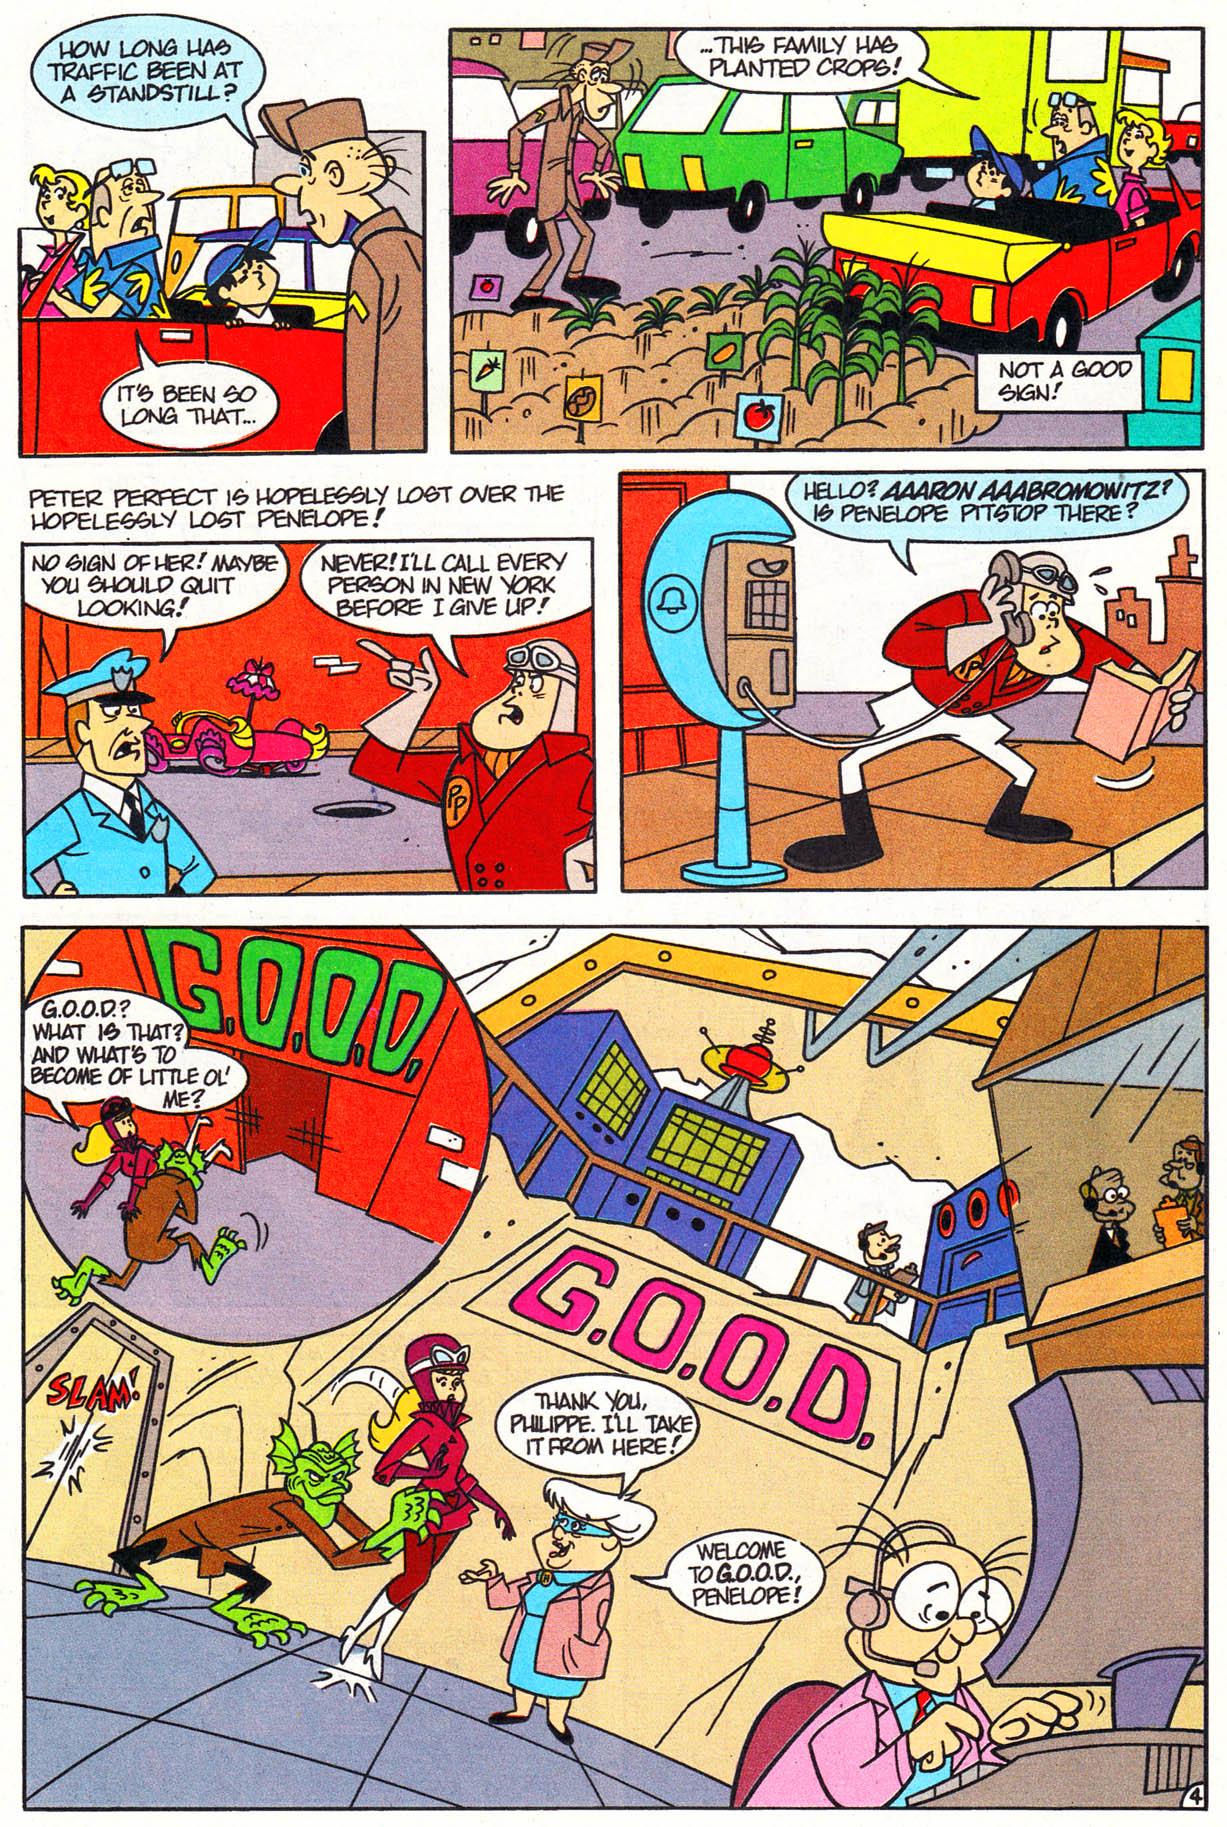 Read online Hanna-Barbera Presents comic -  Issue #2 - 6